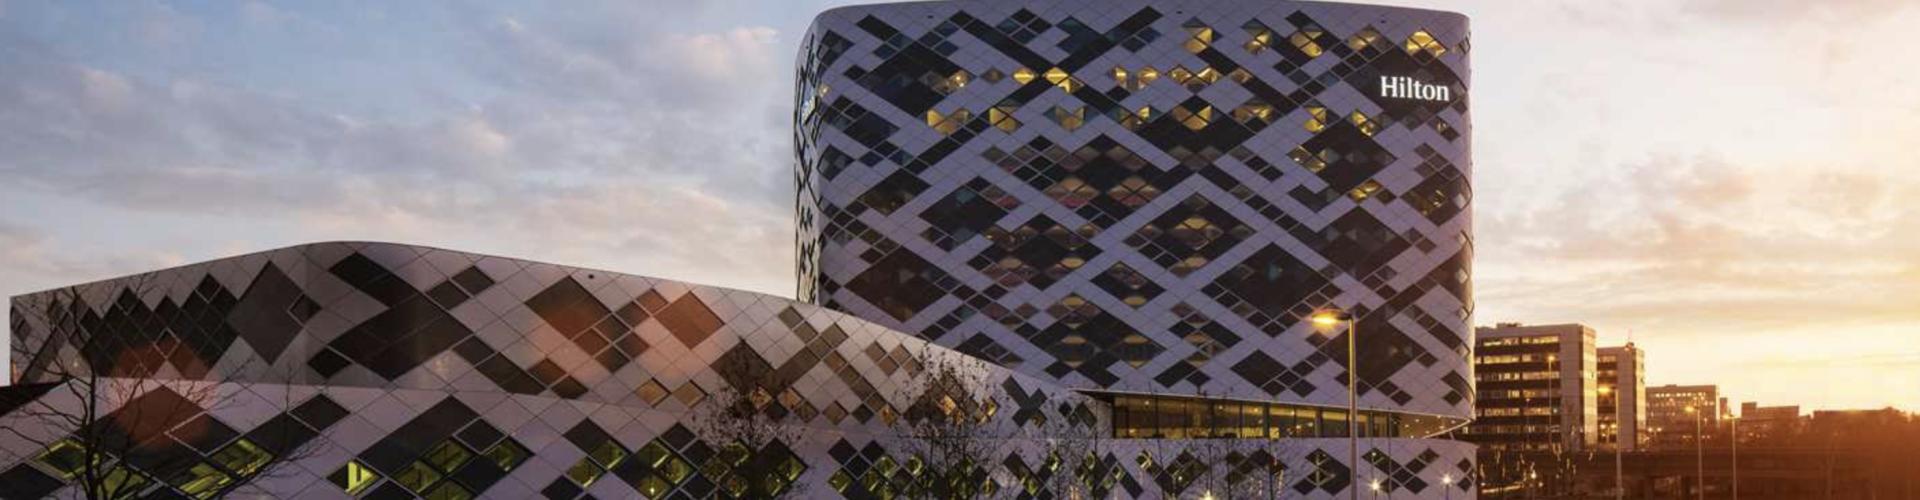 SAP on Azure Tour    Schiphol Hilton Hotel